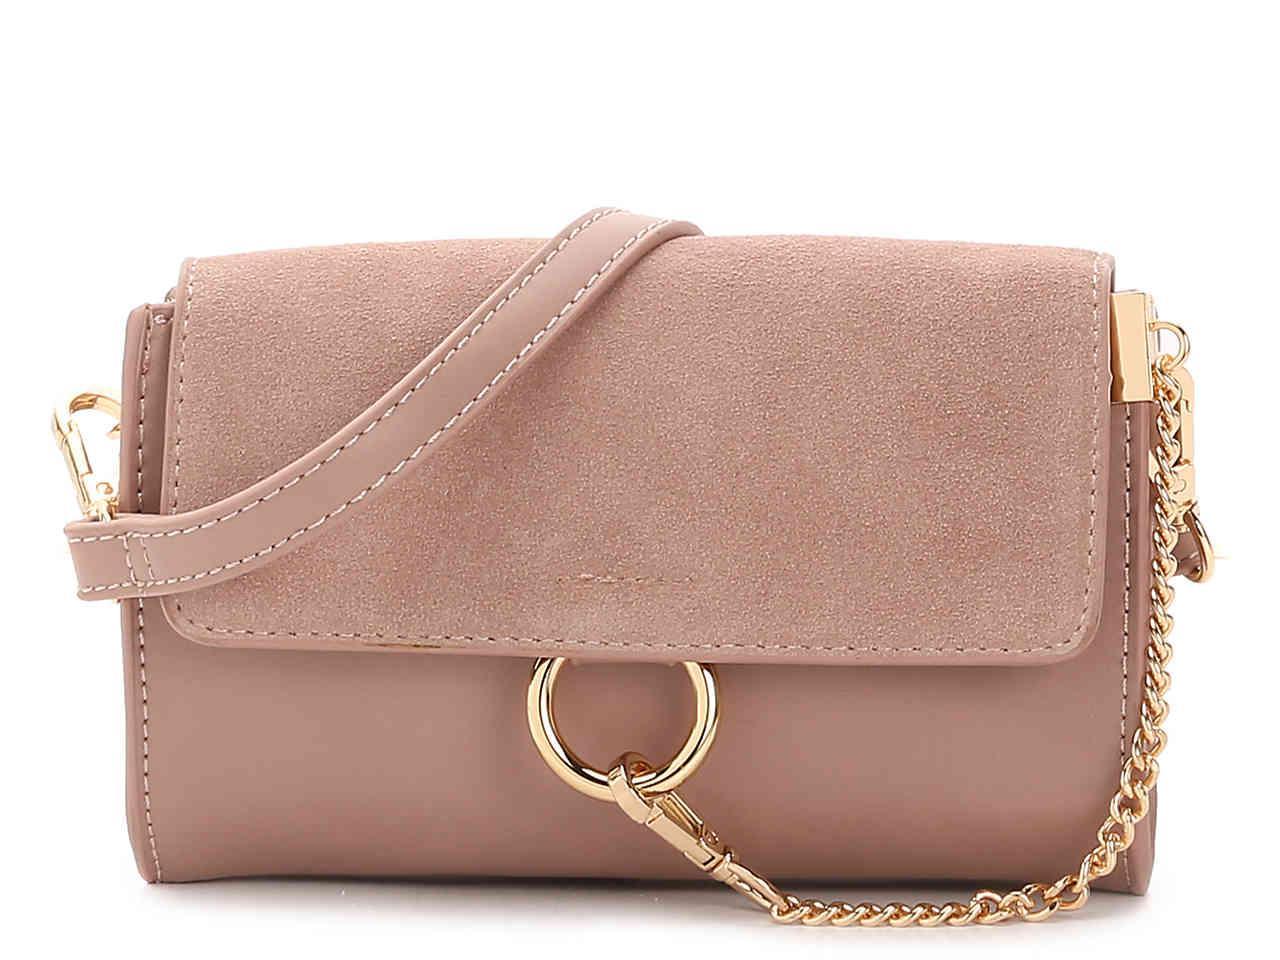 Lyst - Moda Luxe Carlotta Crossbody Bag d2c7e52228